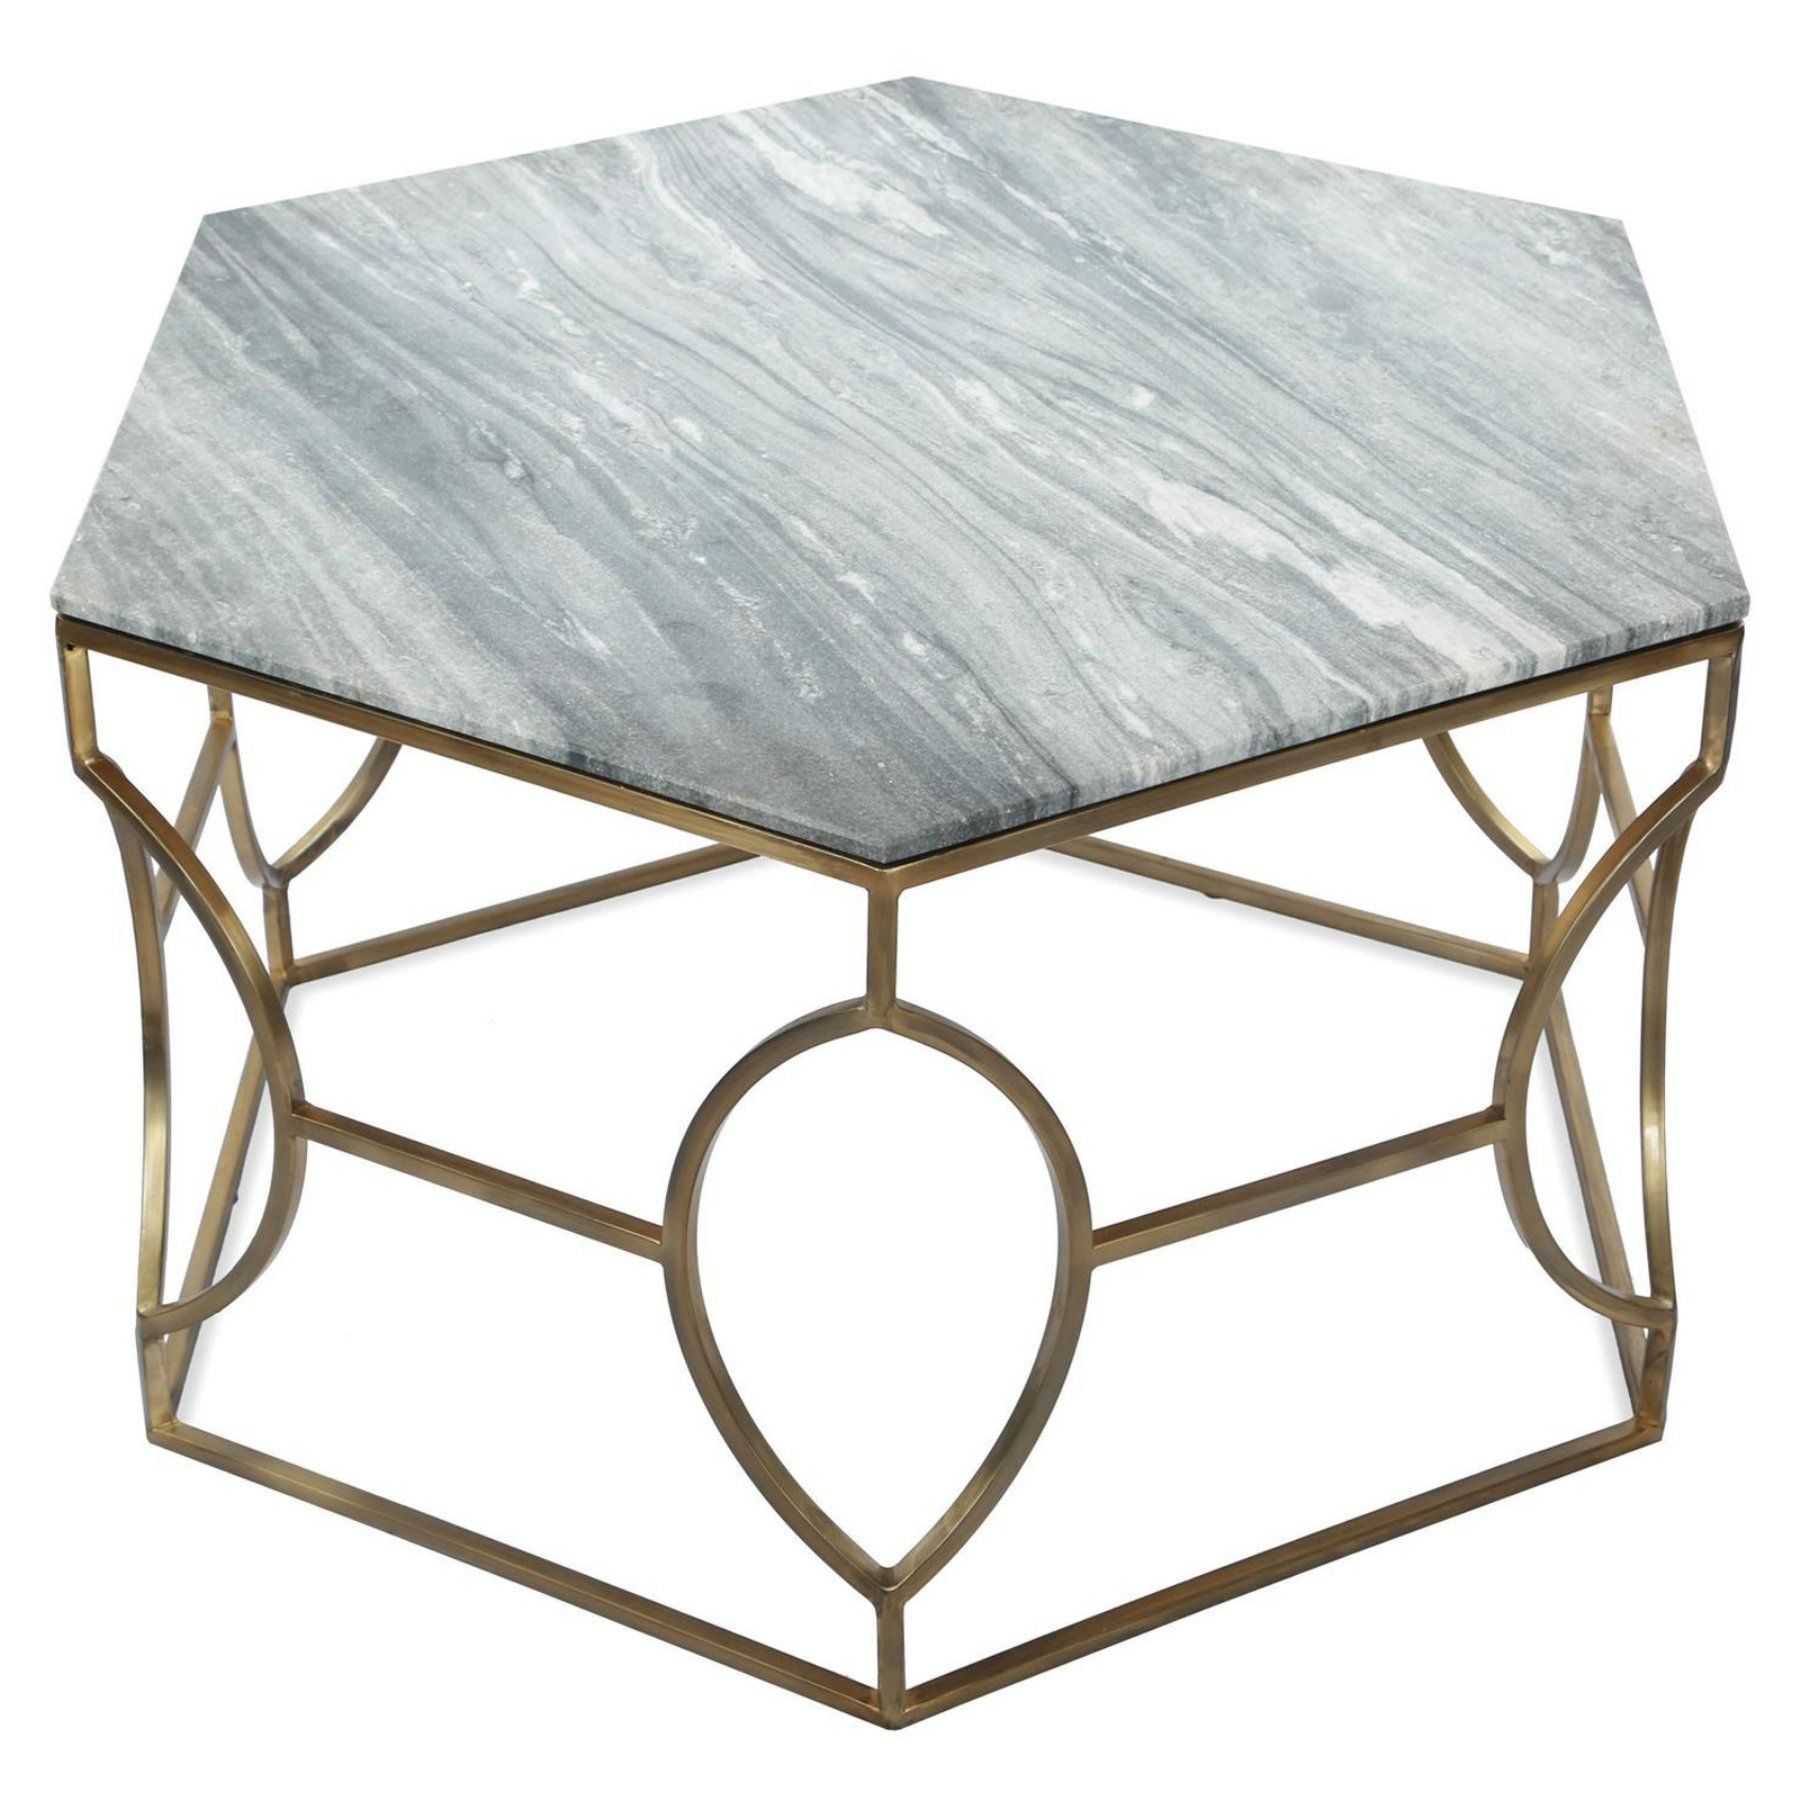 Riverside Furniture Barron Marble Hexagon Coffee Table Marble Top Coffee Table Hexagon Coffee Table Riverside Furniture [ 1800 x 1800 Pixel ]